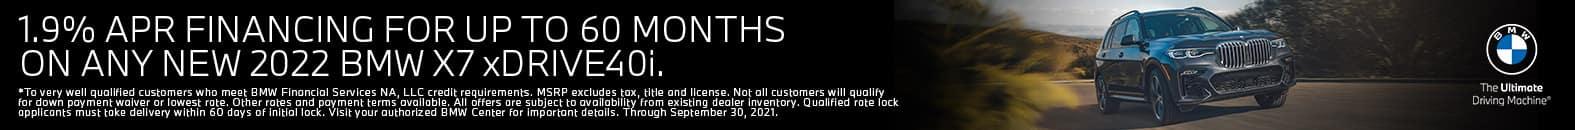 1.9% APR For Up To 60 Months | 2022 BMW X7 xDrive40i | Bert Ogden BMW in McAllen, Texas